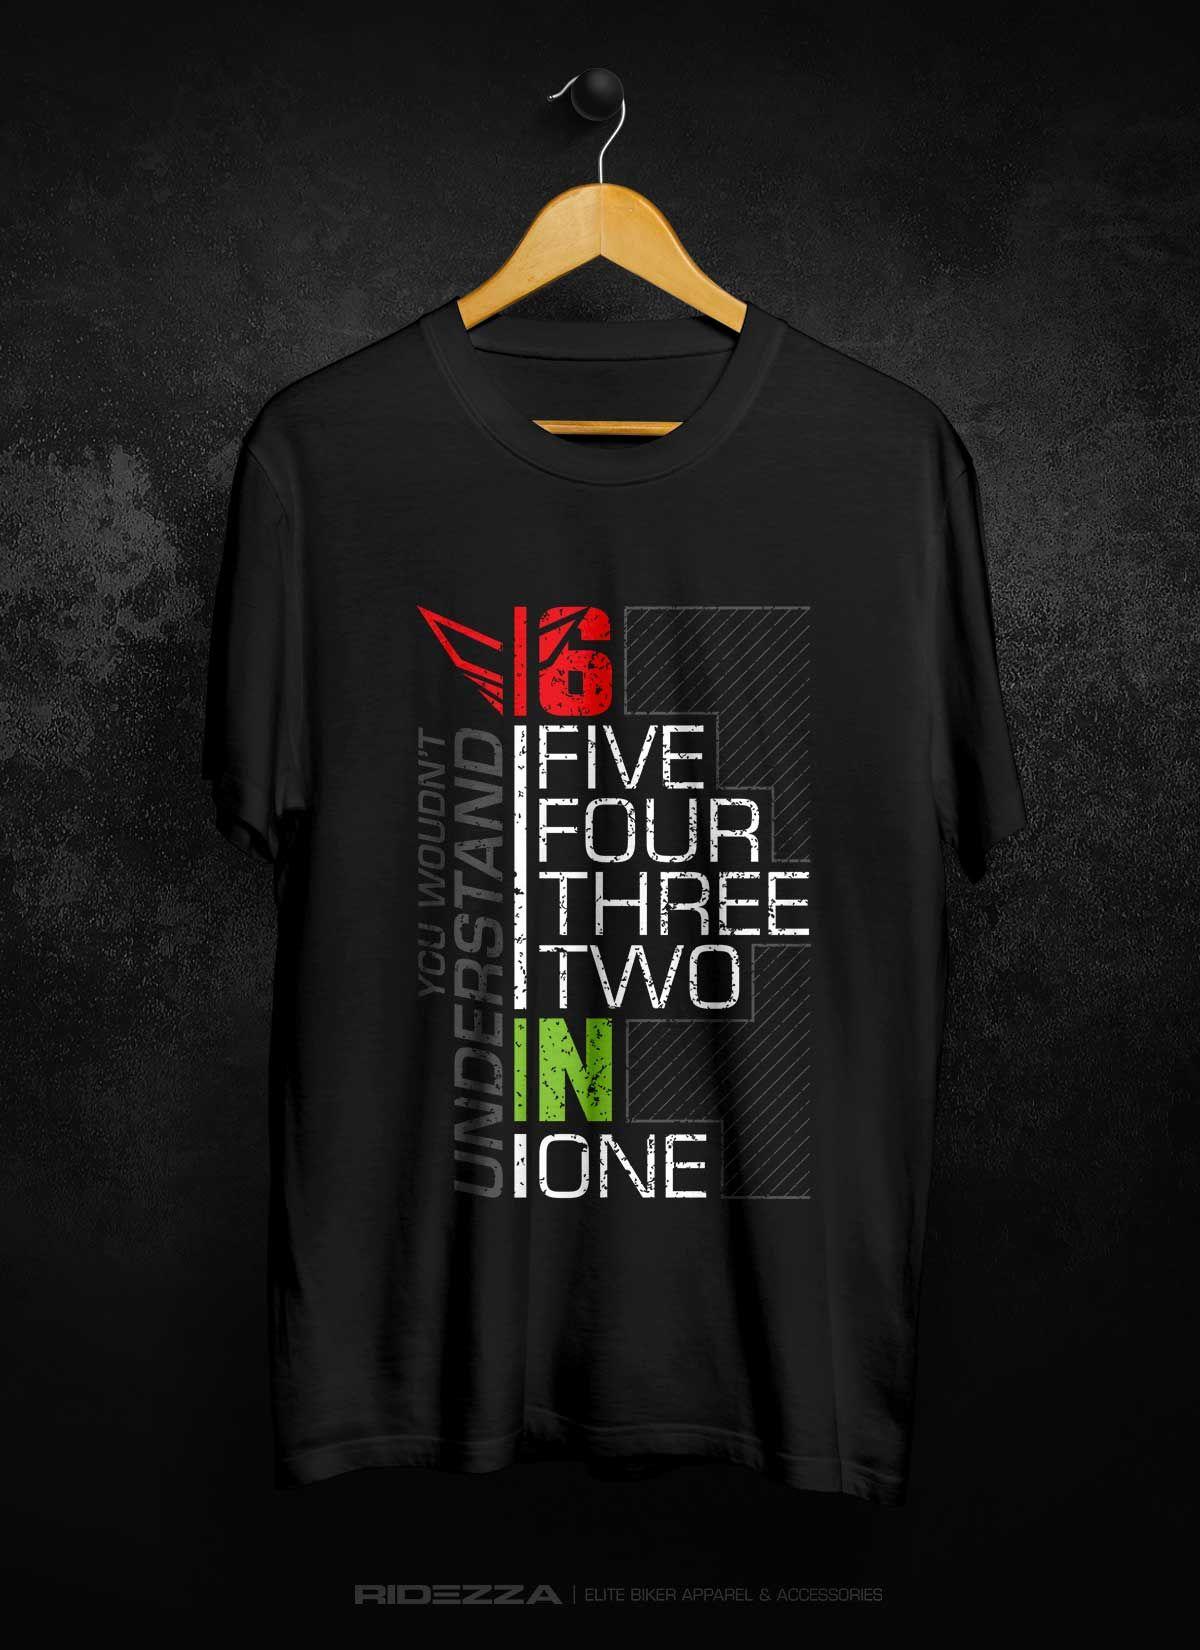 Motorcycle Gear Shift V 2 T Shirt Con Imagenes Ropa Modelos